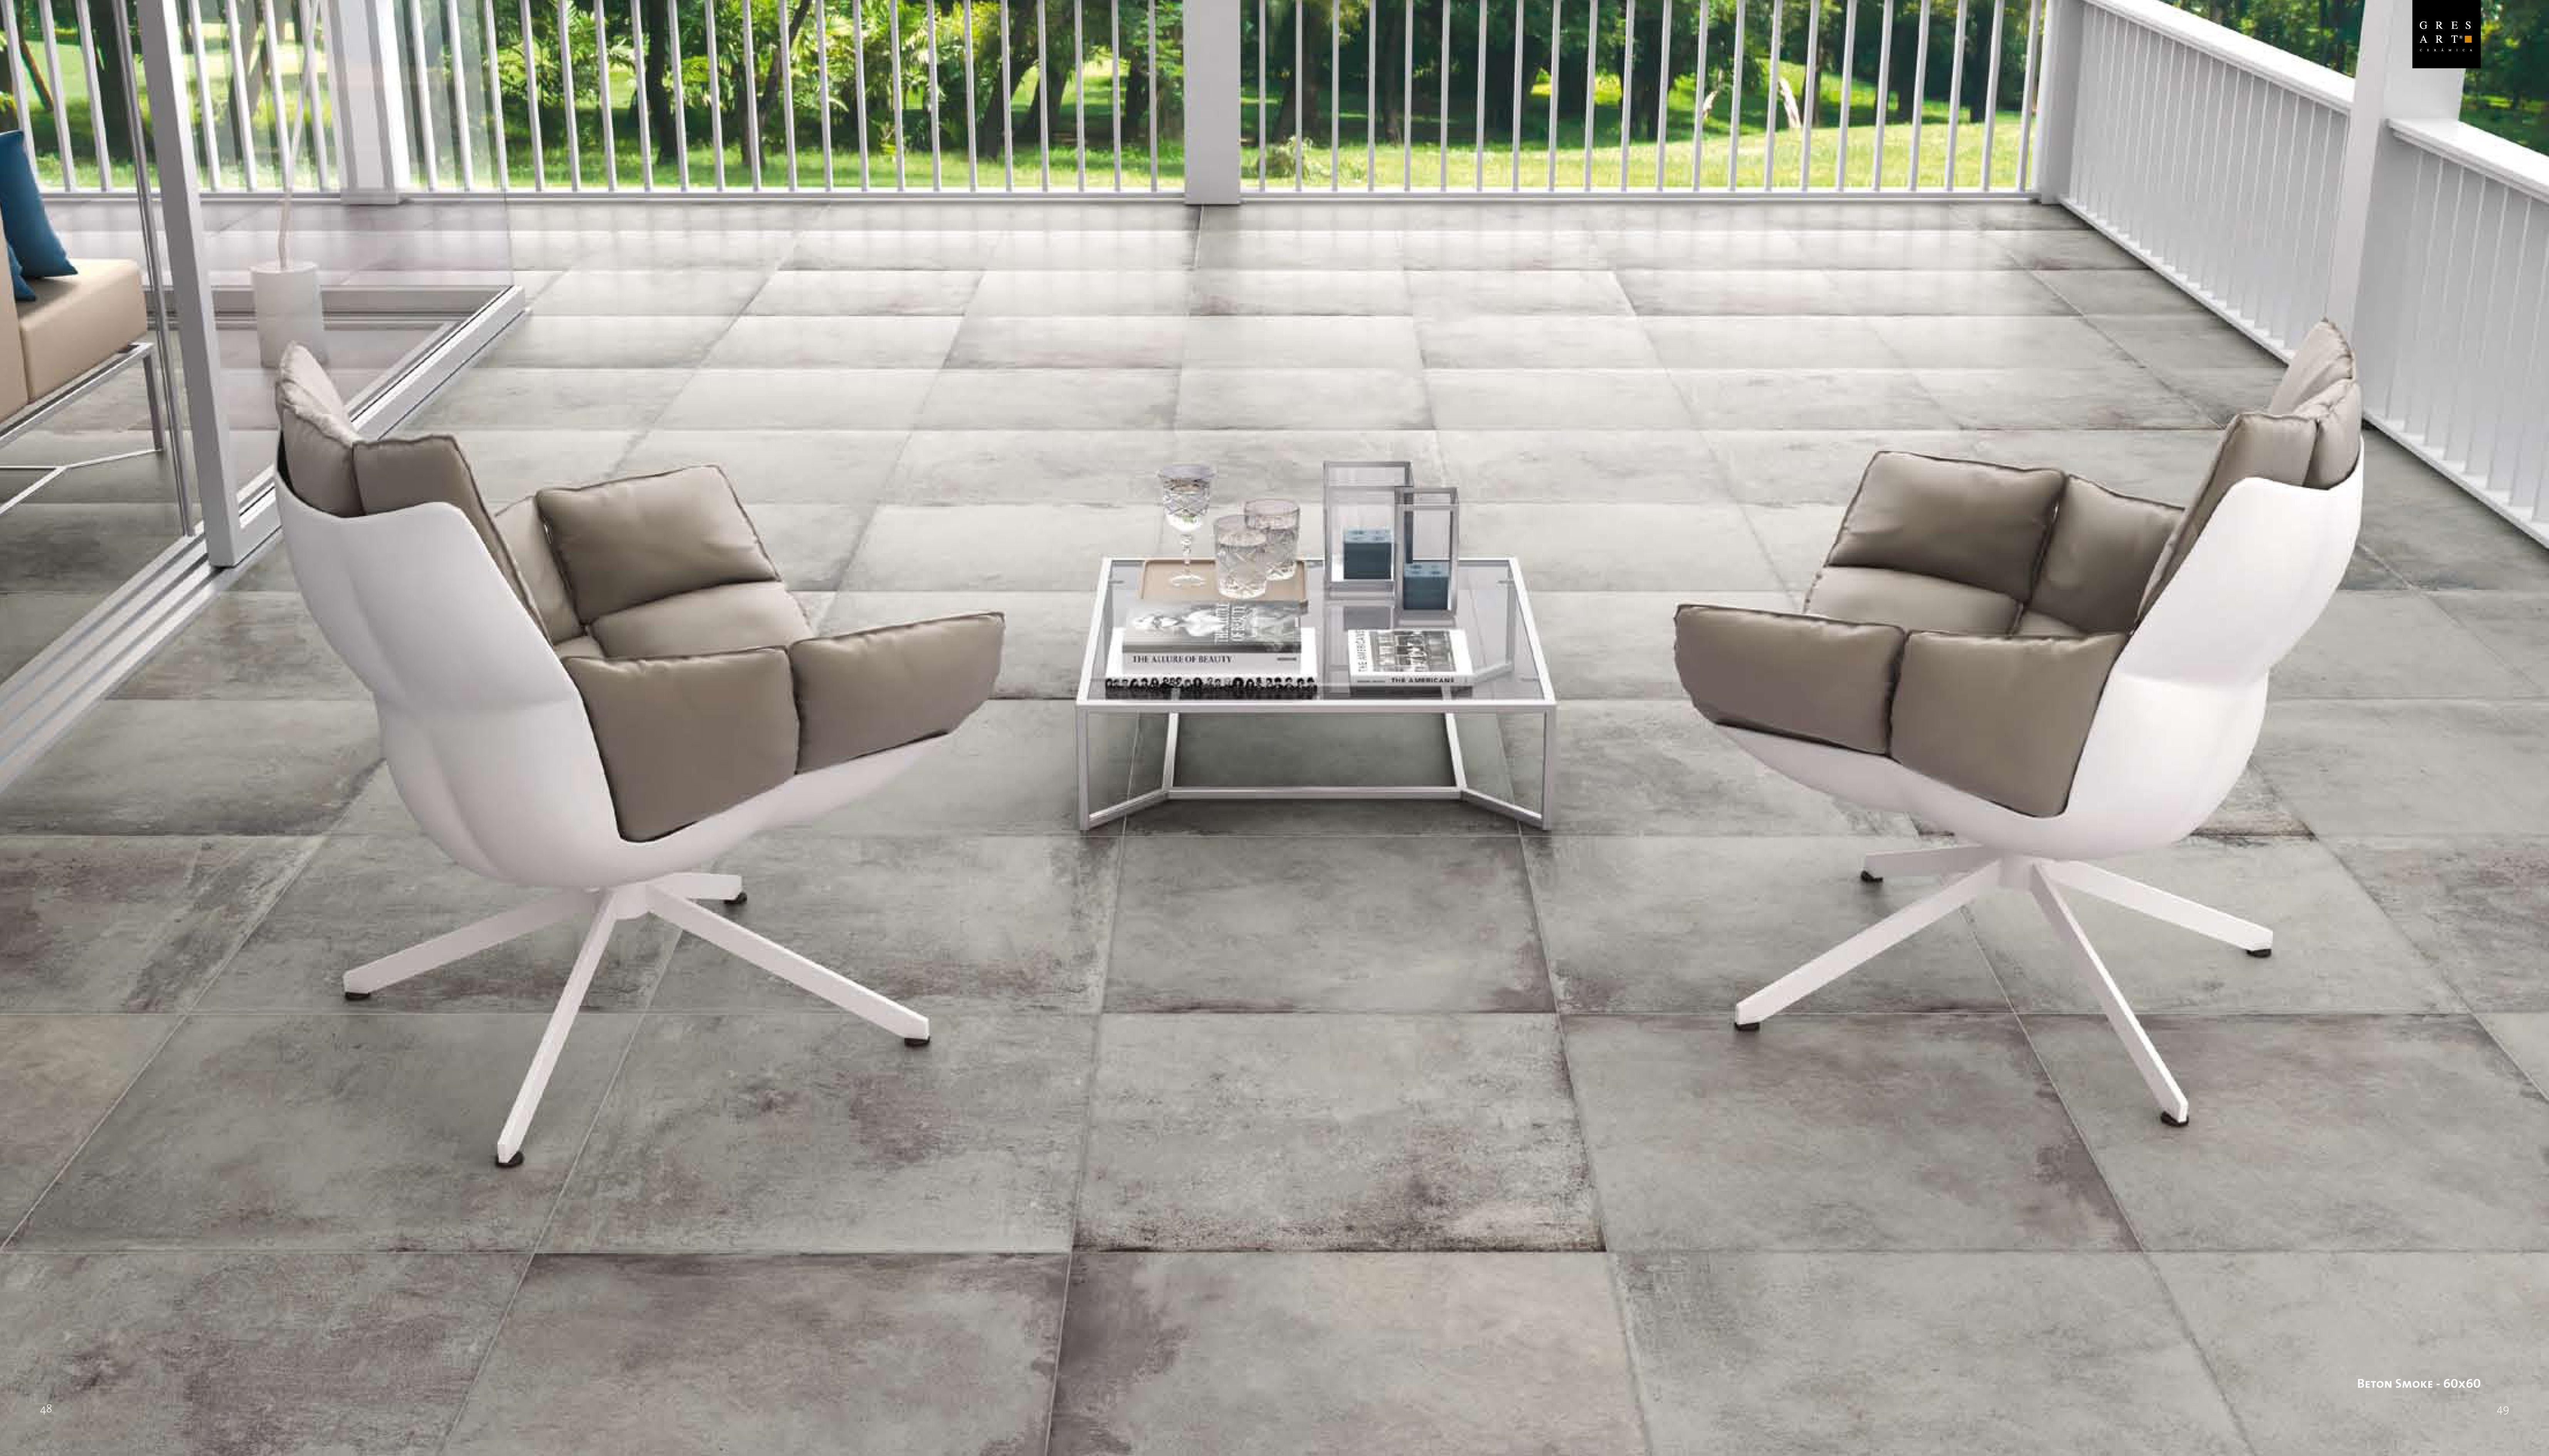 Captivating Gresart Ceramica   Beton Smoke 60x60 # Tiles # Tegels